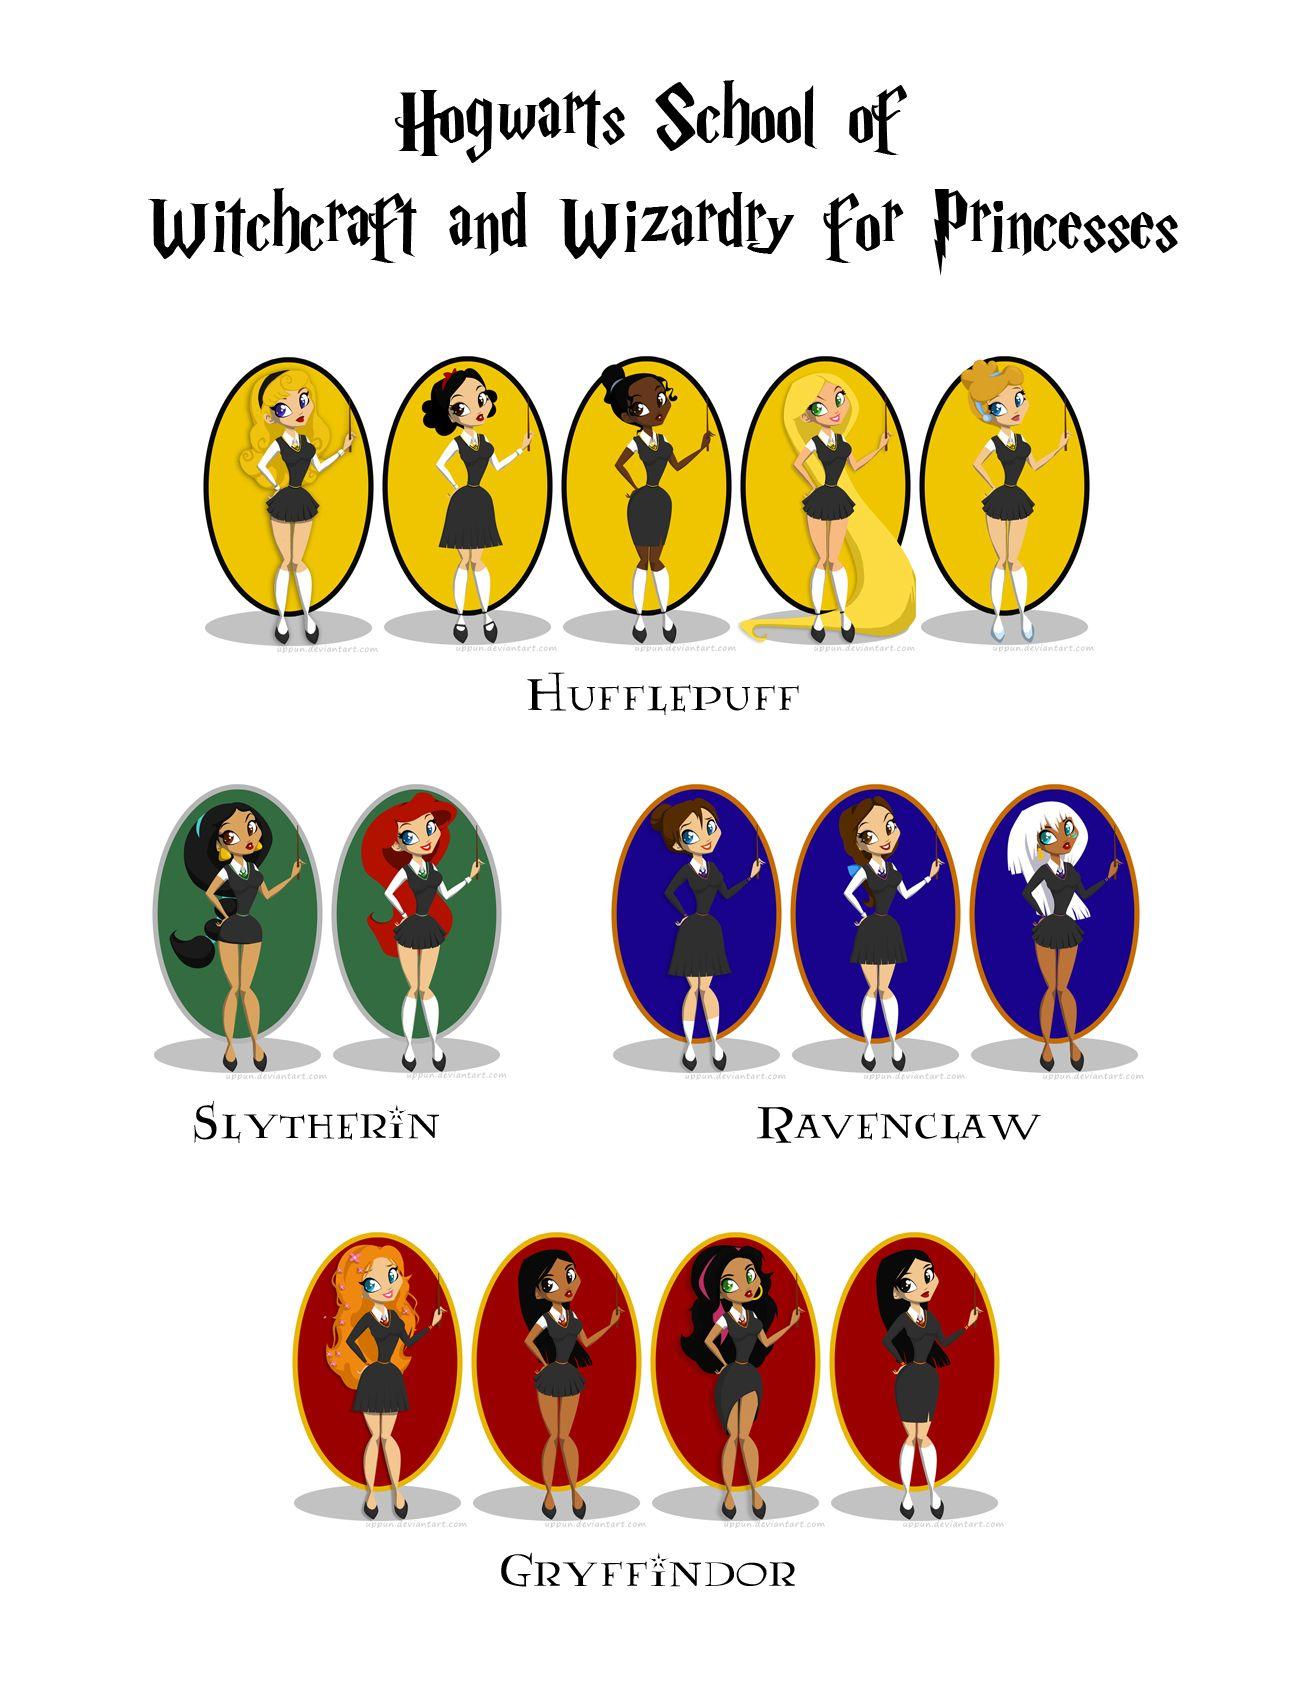 Disney By Uppun On Deviantart Harry Potter Disney Disney Hogwarts Harry Potter Crossover